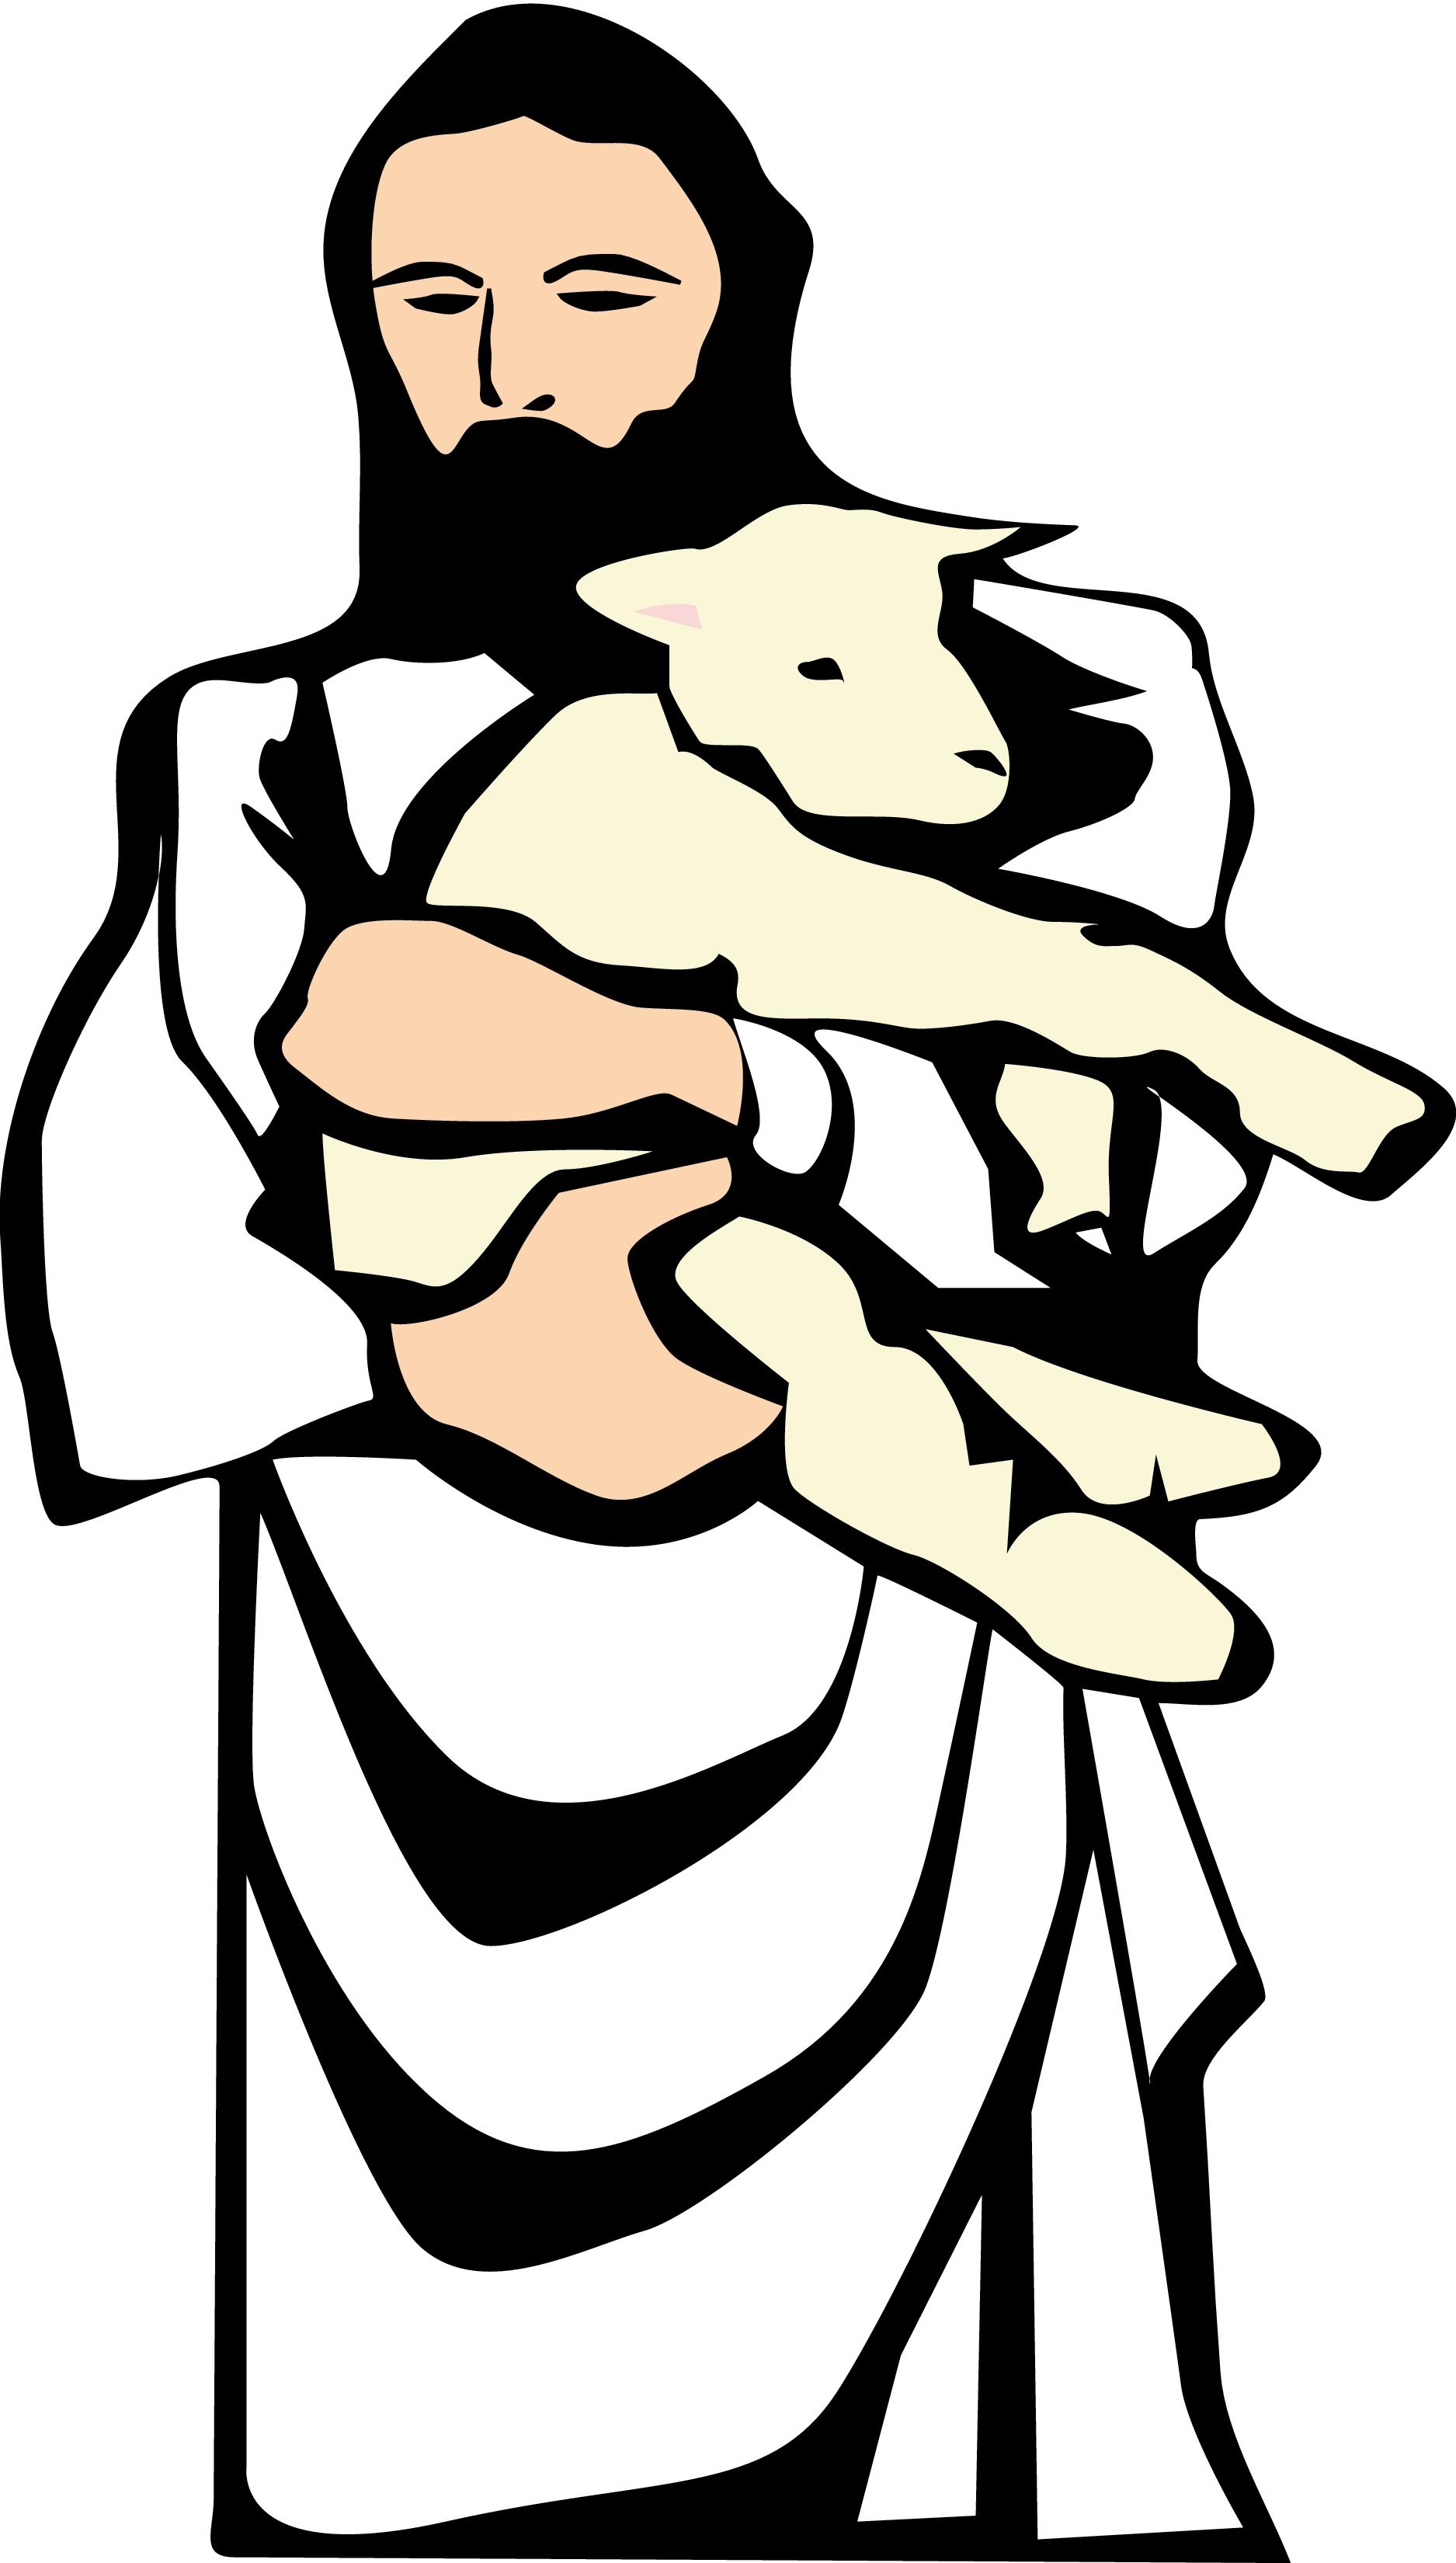 1875x3300 Clip Art The Lord Is My Shepherd Clip Art